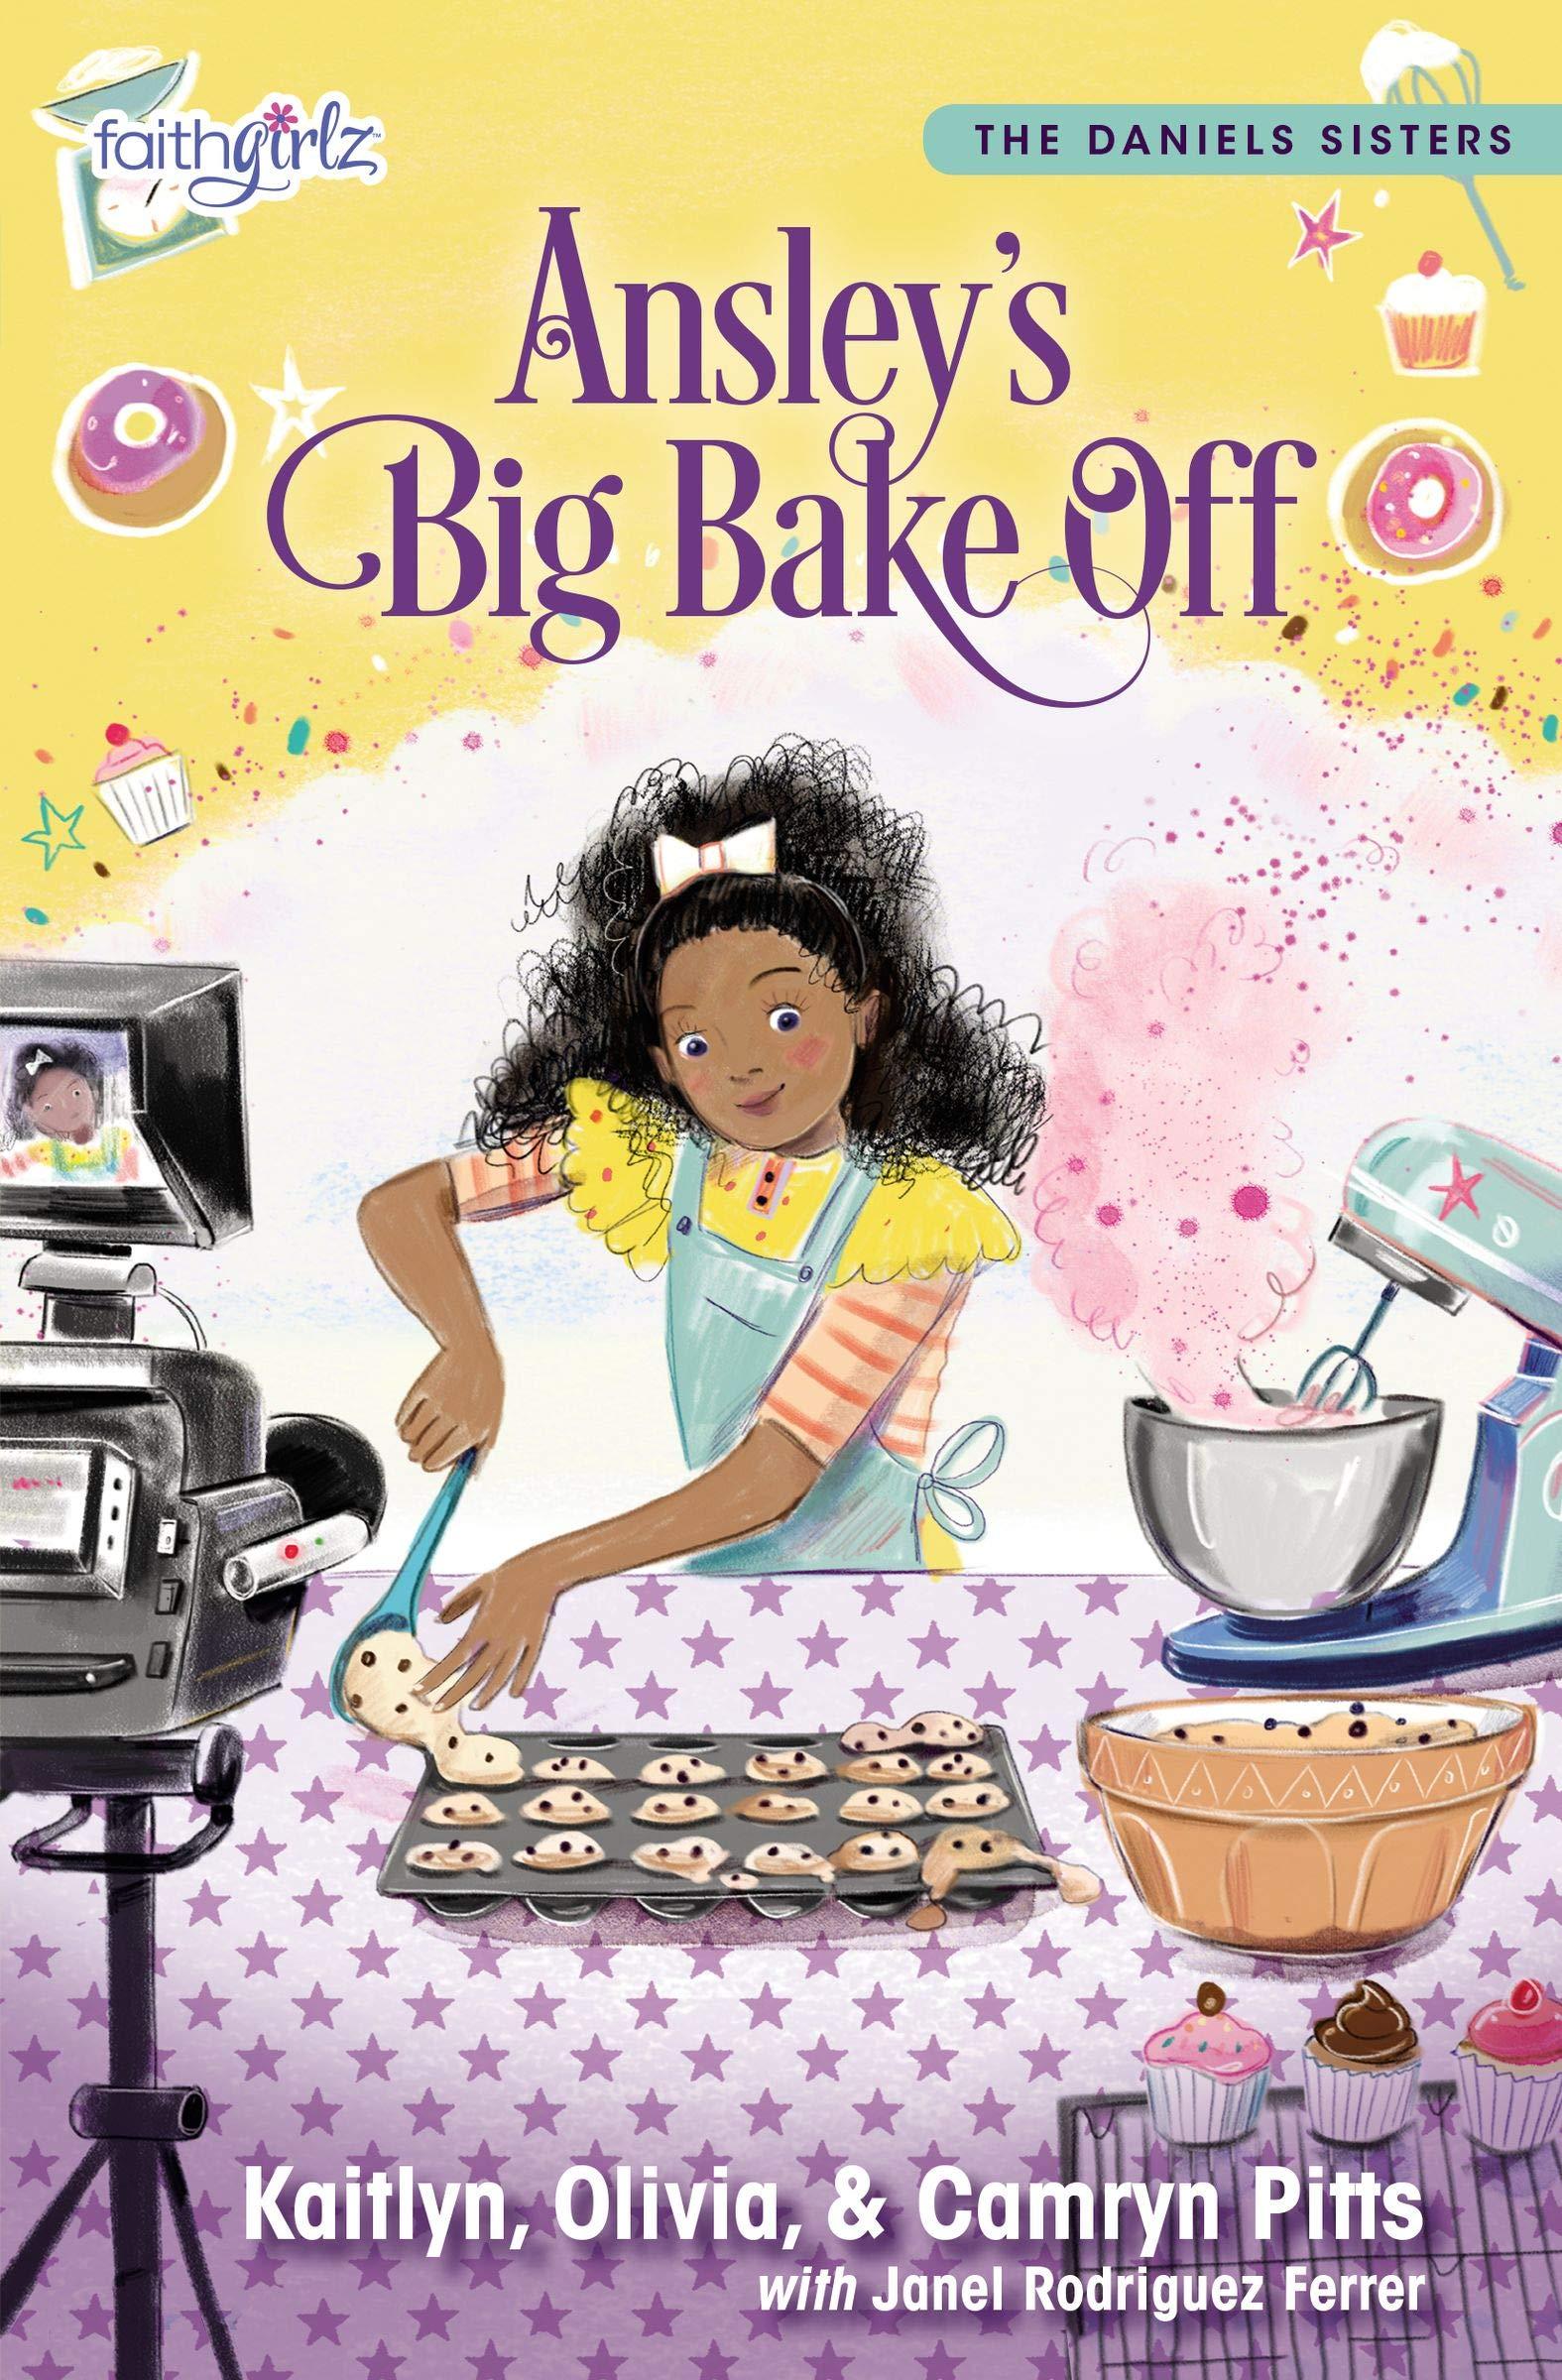 Ansleys Big Bake Off Faithgirlz / The Daniels Sisters: Amazon.es ...